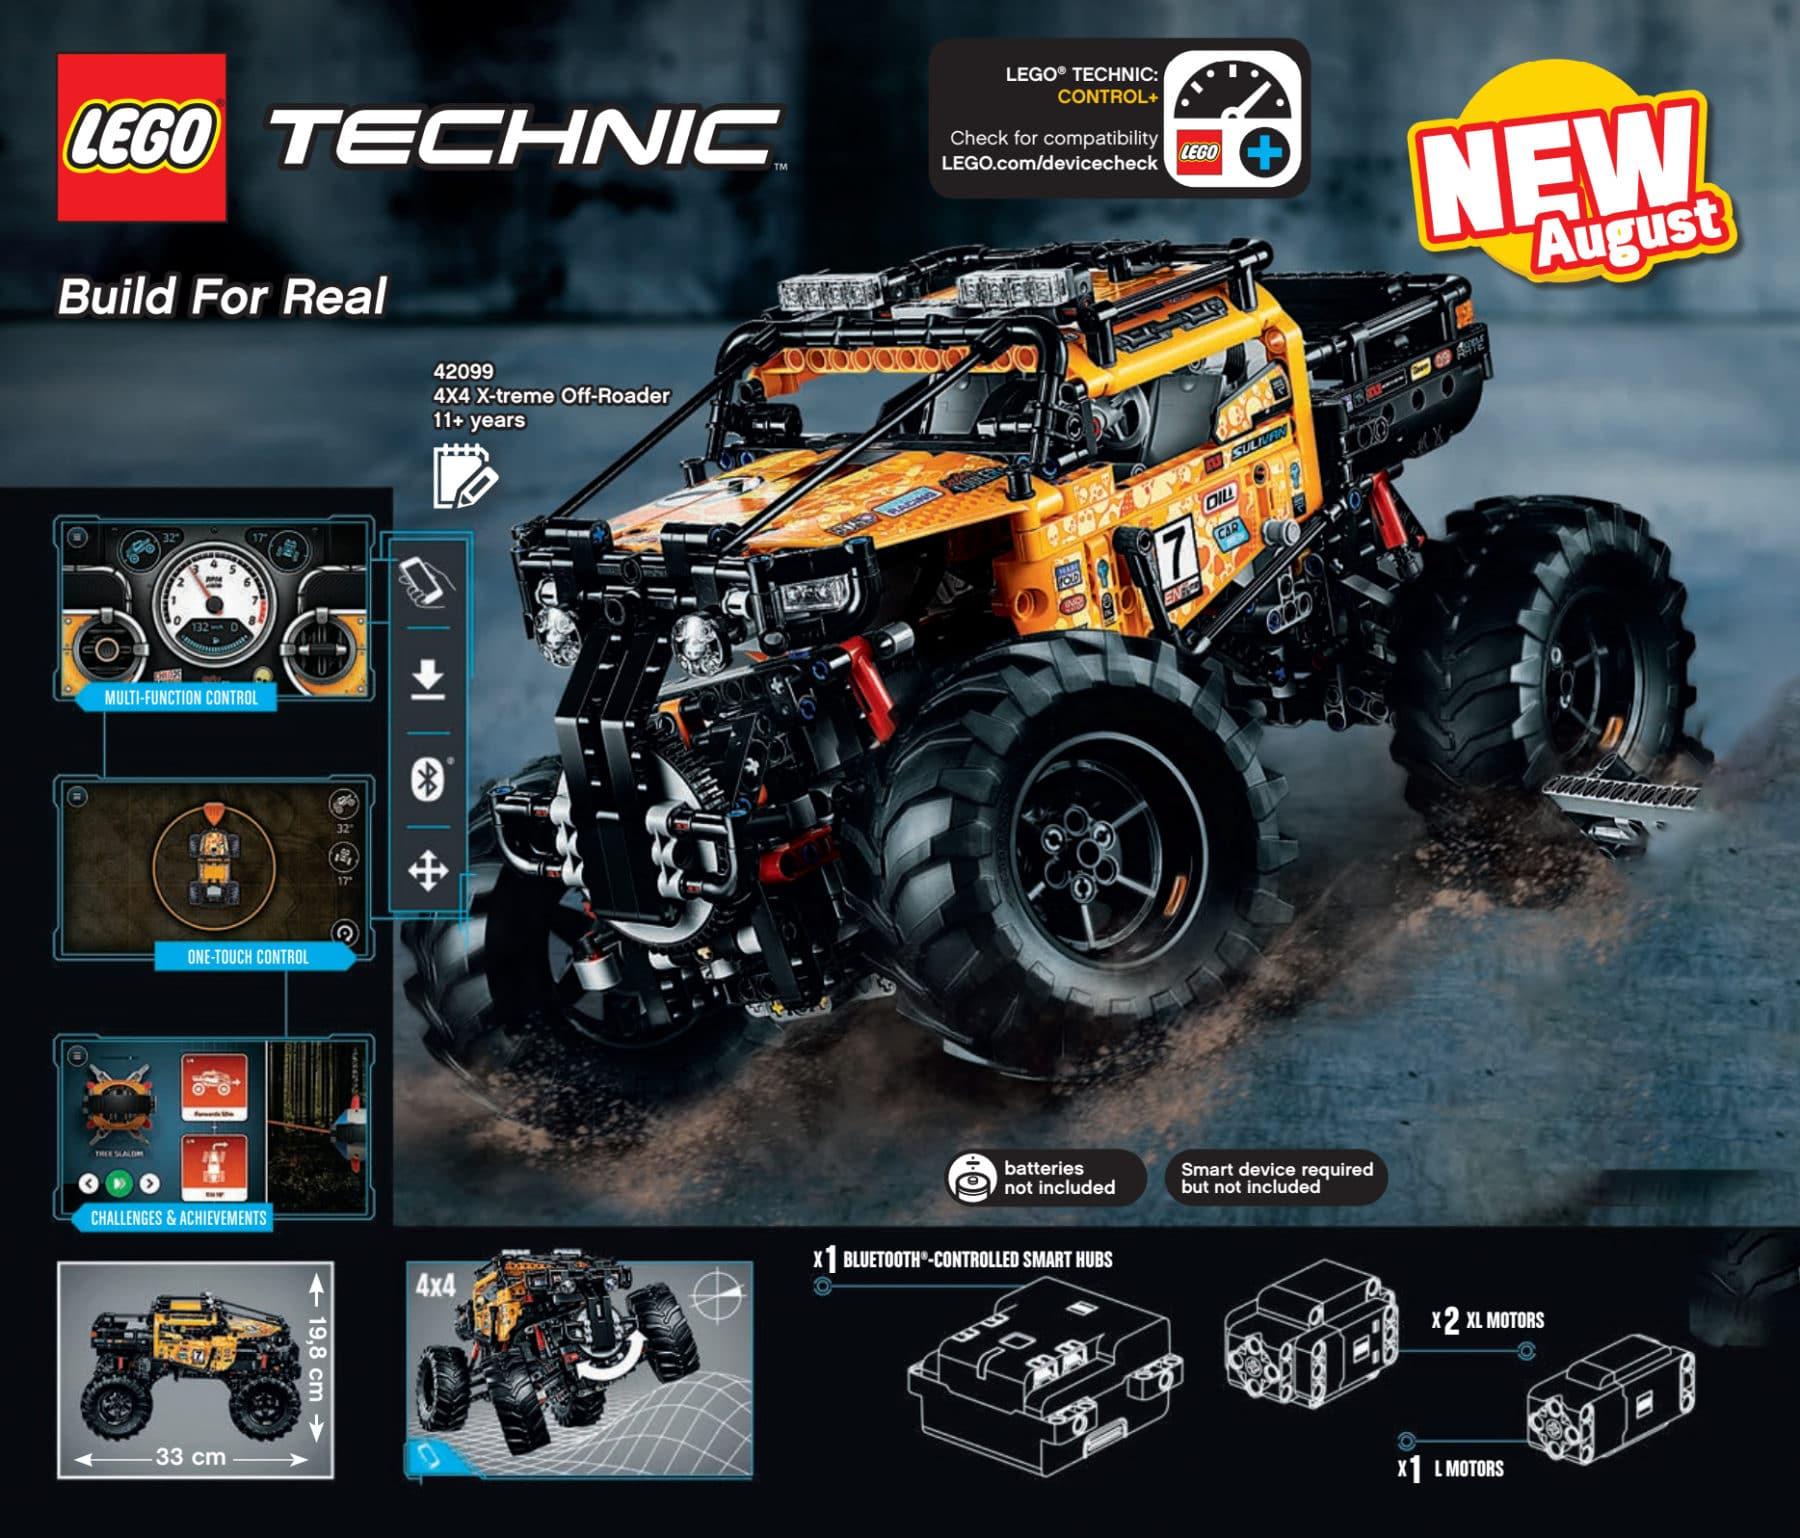 LEGO Technic 42099 X-treme Off-Roader